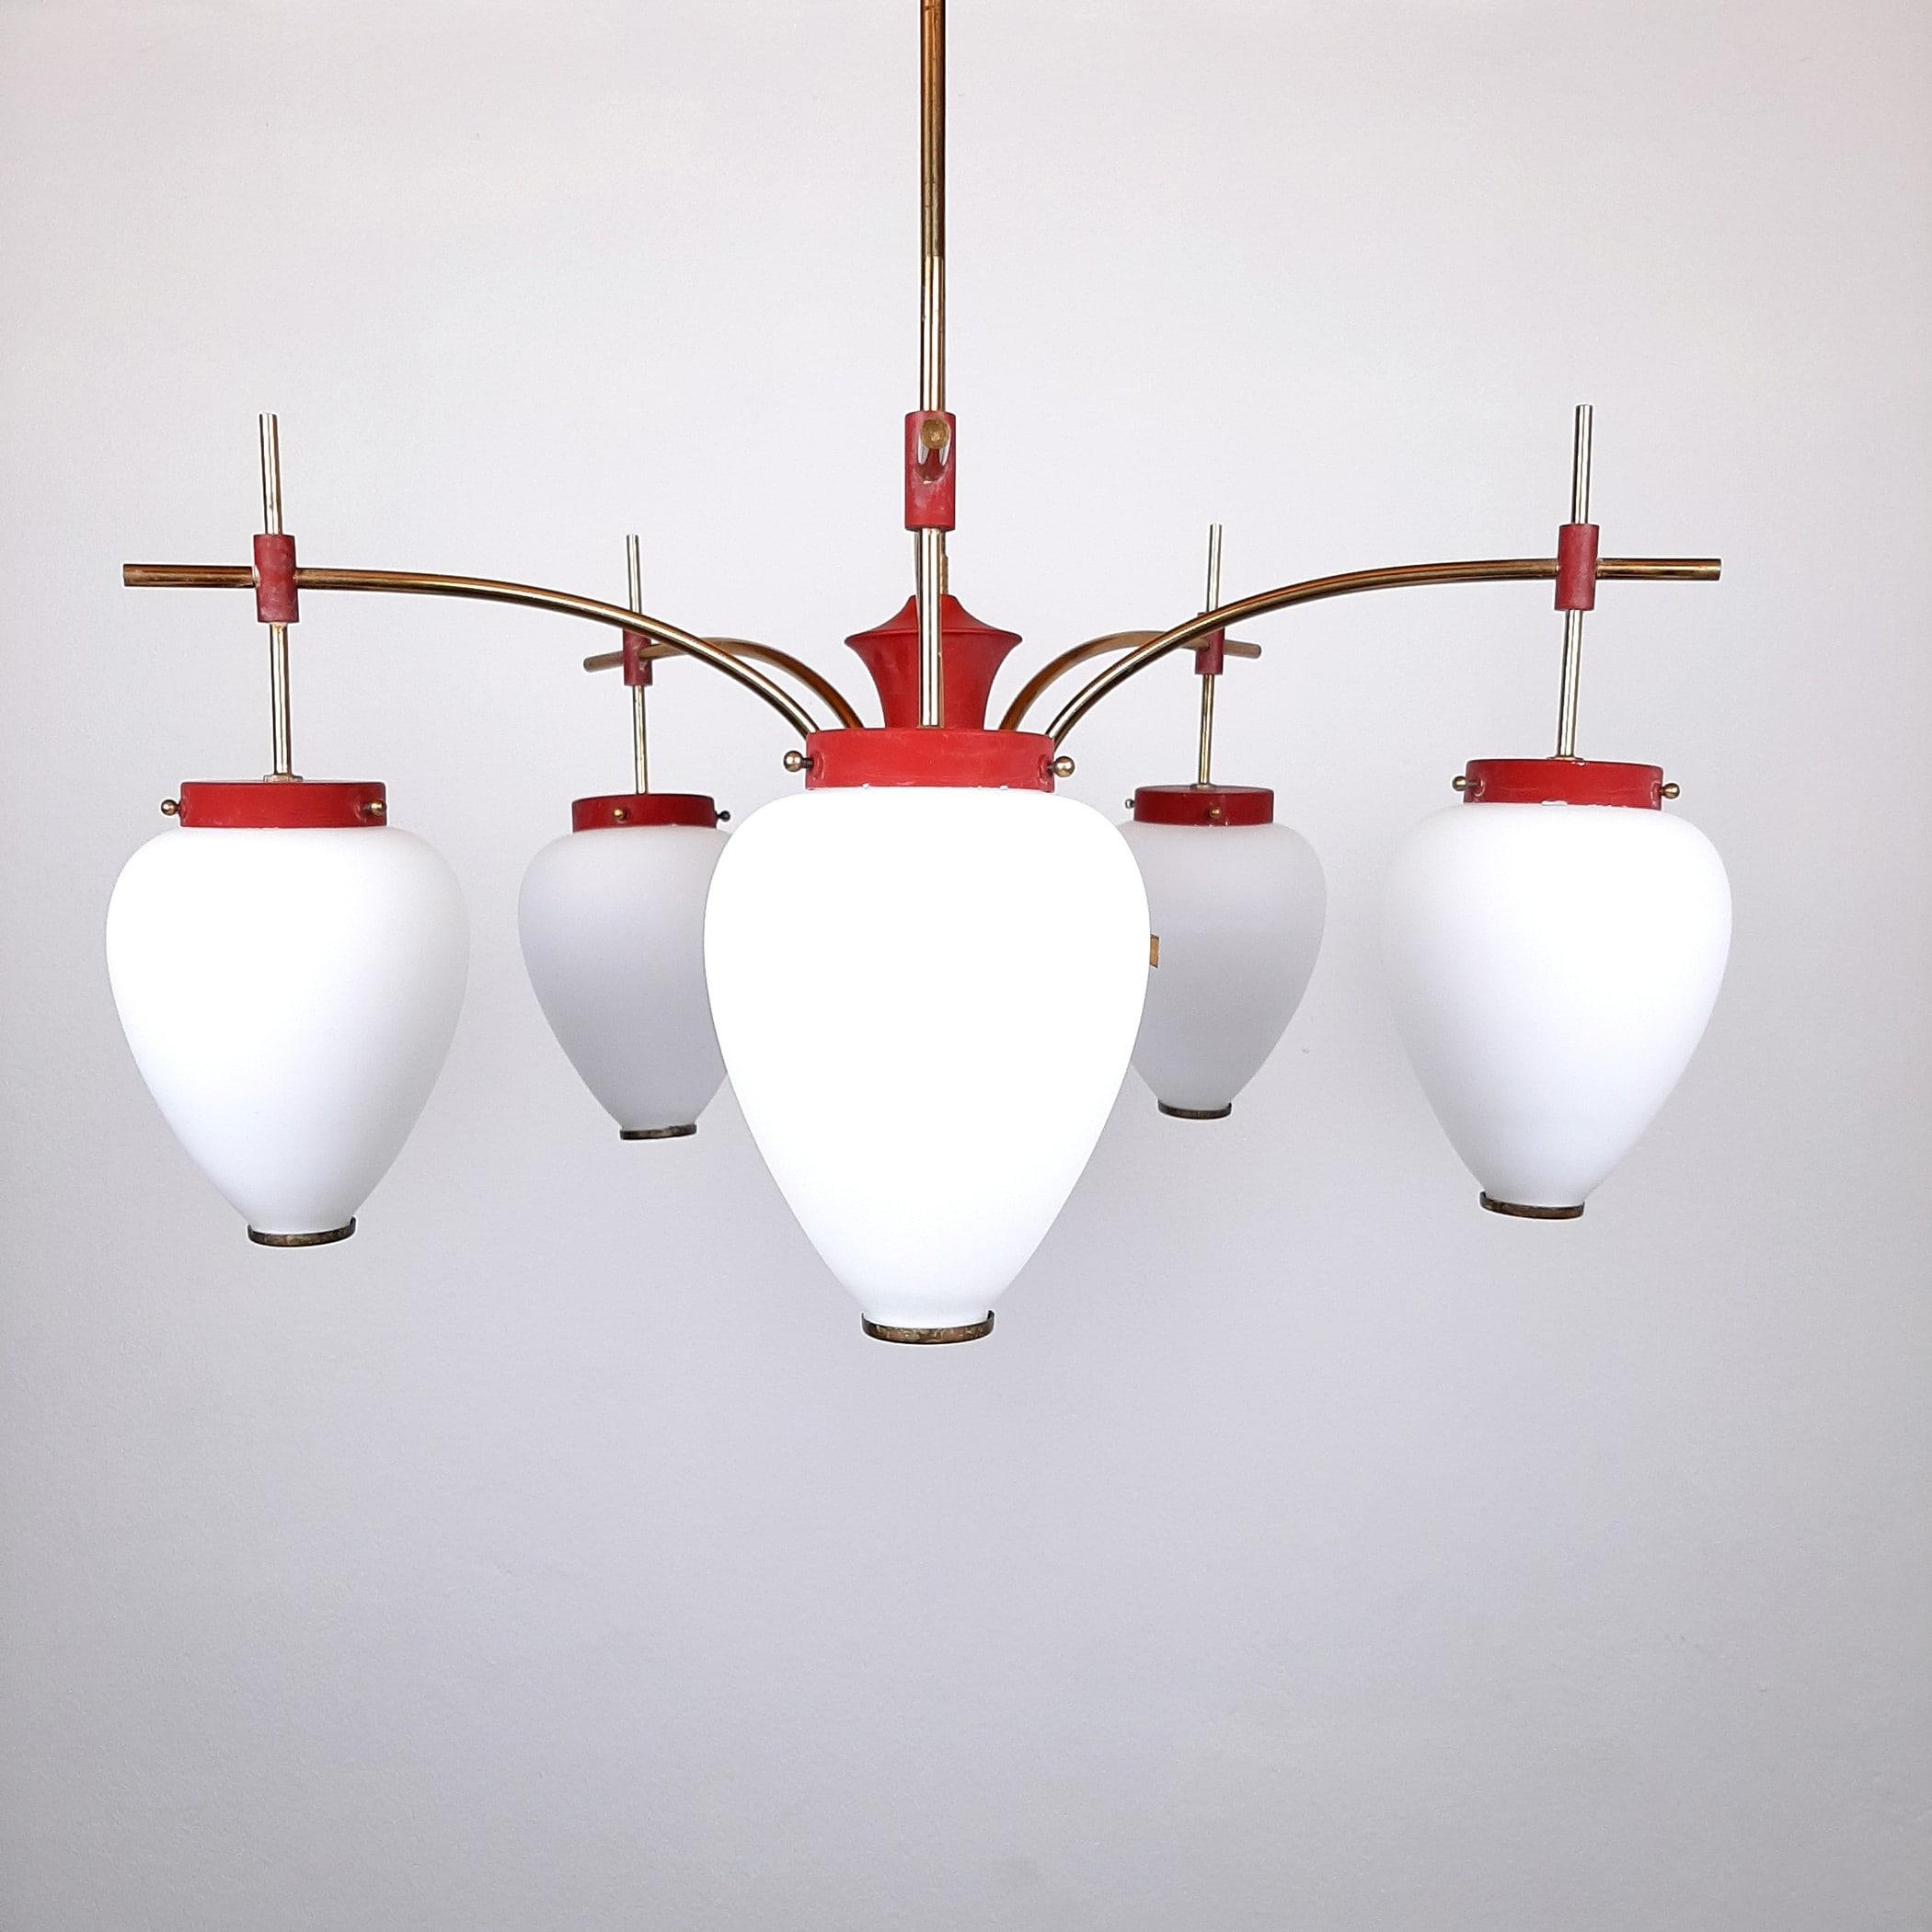 Mid-century red pendant lamp from Stilnovo Italy 1960s Art Deco